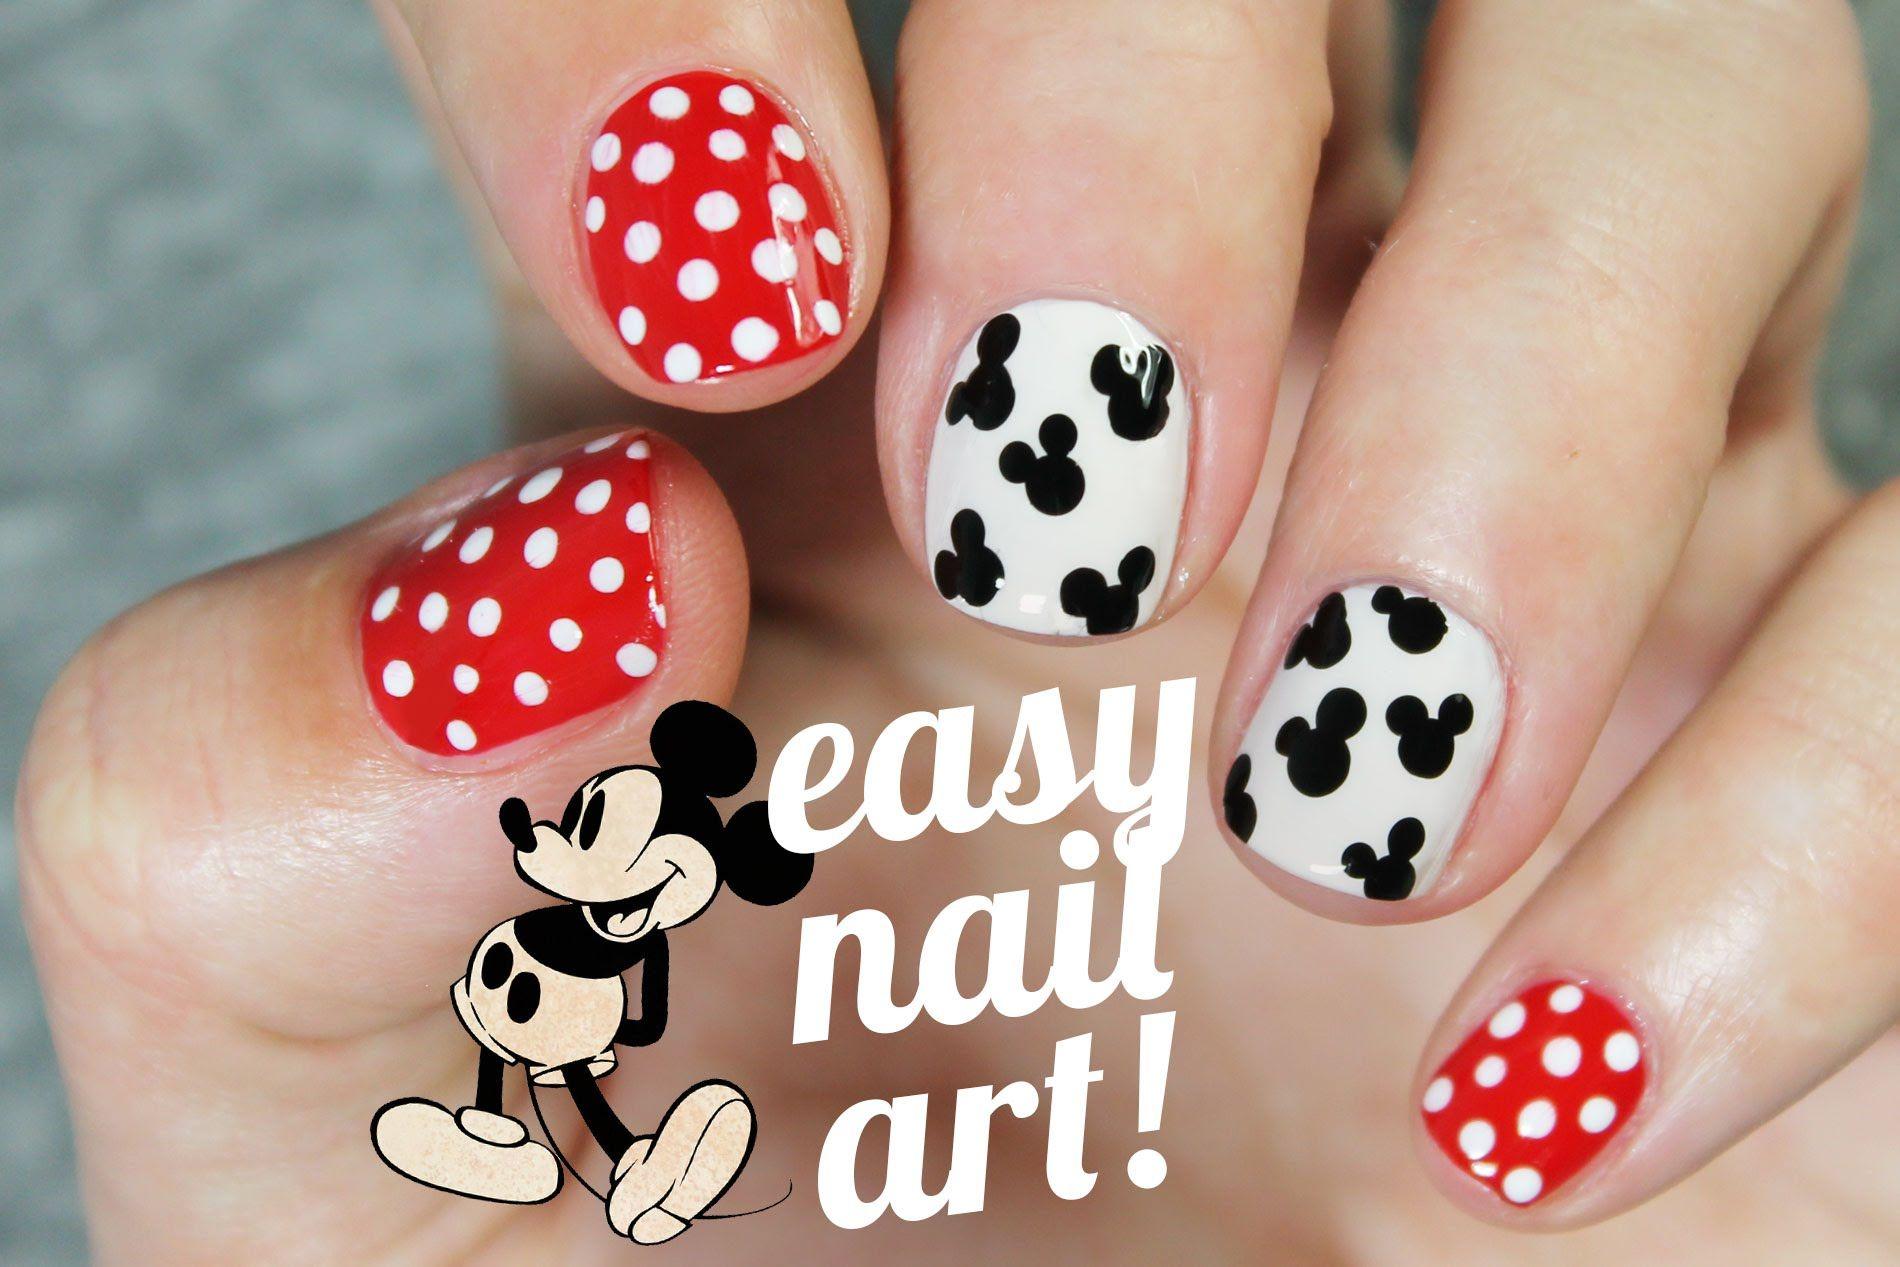 Pin by Carlafran on uñas diseño   Pinterest   Manicure ideas and ...